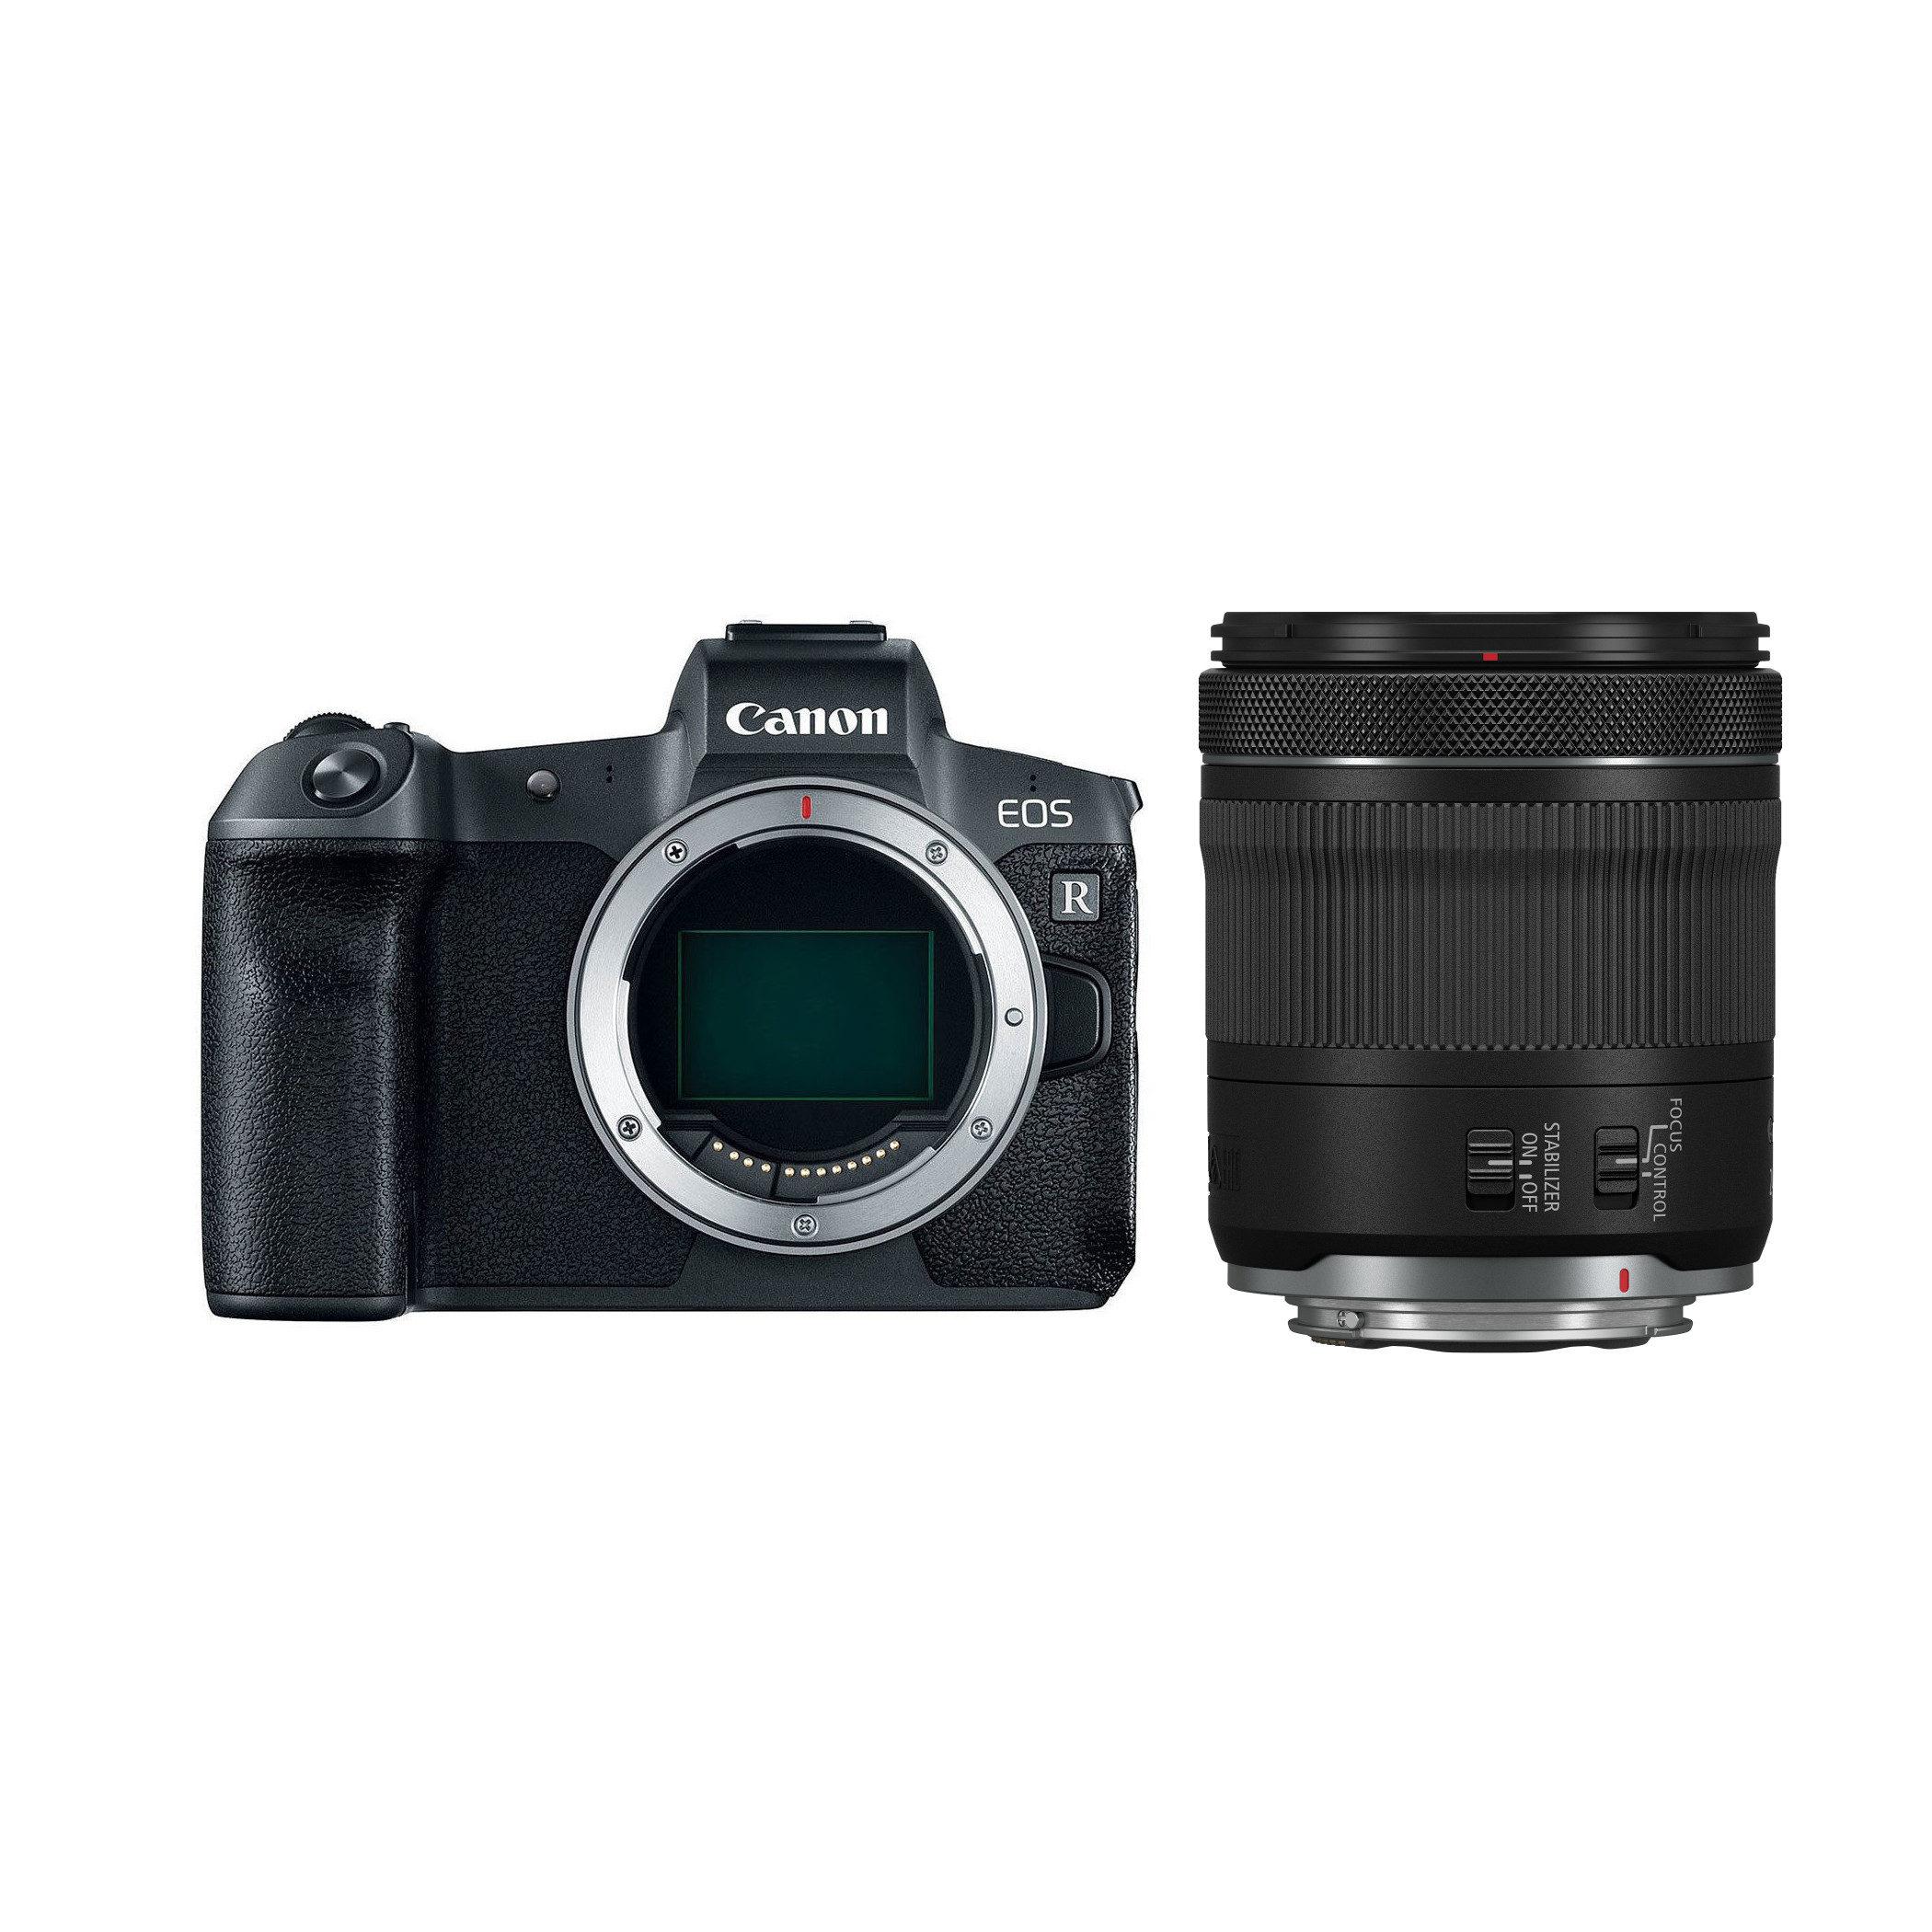 Canon EOS R systeemcamera Zwart + RF 24-105mm f/4-7.1 IS STM <br/>€ 1899.00 <br/> <a href='https://www.cameranu.nl/fotografie/?tt=12190_474631_241358_&r=https%3A%2F%2Fwww.cameranu.nl%2Fnl%2Fp3172682%2Fcanon-eos-r-systeemcamera-zwart-rf-24-105mm-f-4-7-1-is-stm%3Fchannable%3D002a596964003331373236383217%26utm_campaign%3D%26utm_content%3DCanon%2Bpro%2Bcamera%26utm_source%3DTradetracker%26utm_medium%3Dcpc%26utm_term%3DDigitale%2Bcamera%26apos%3Bs' target='_blank'>naar de winkel</a>